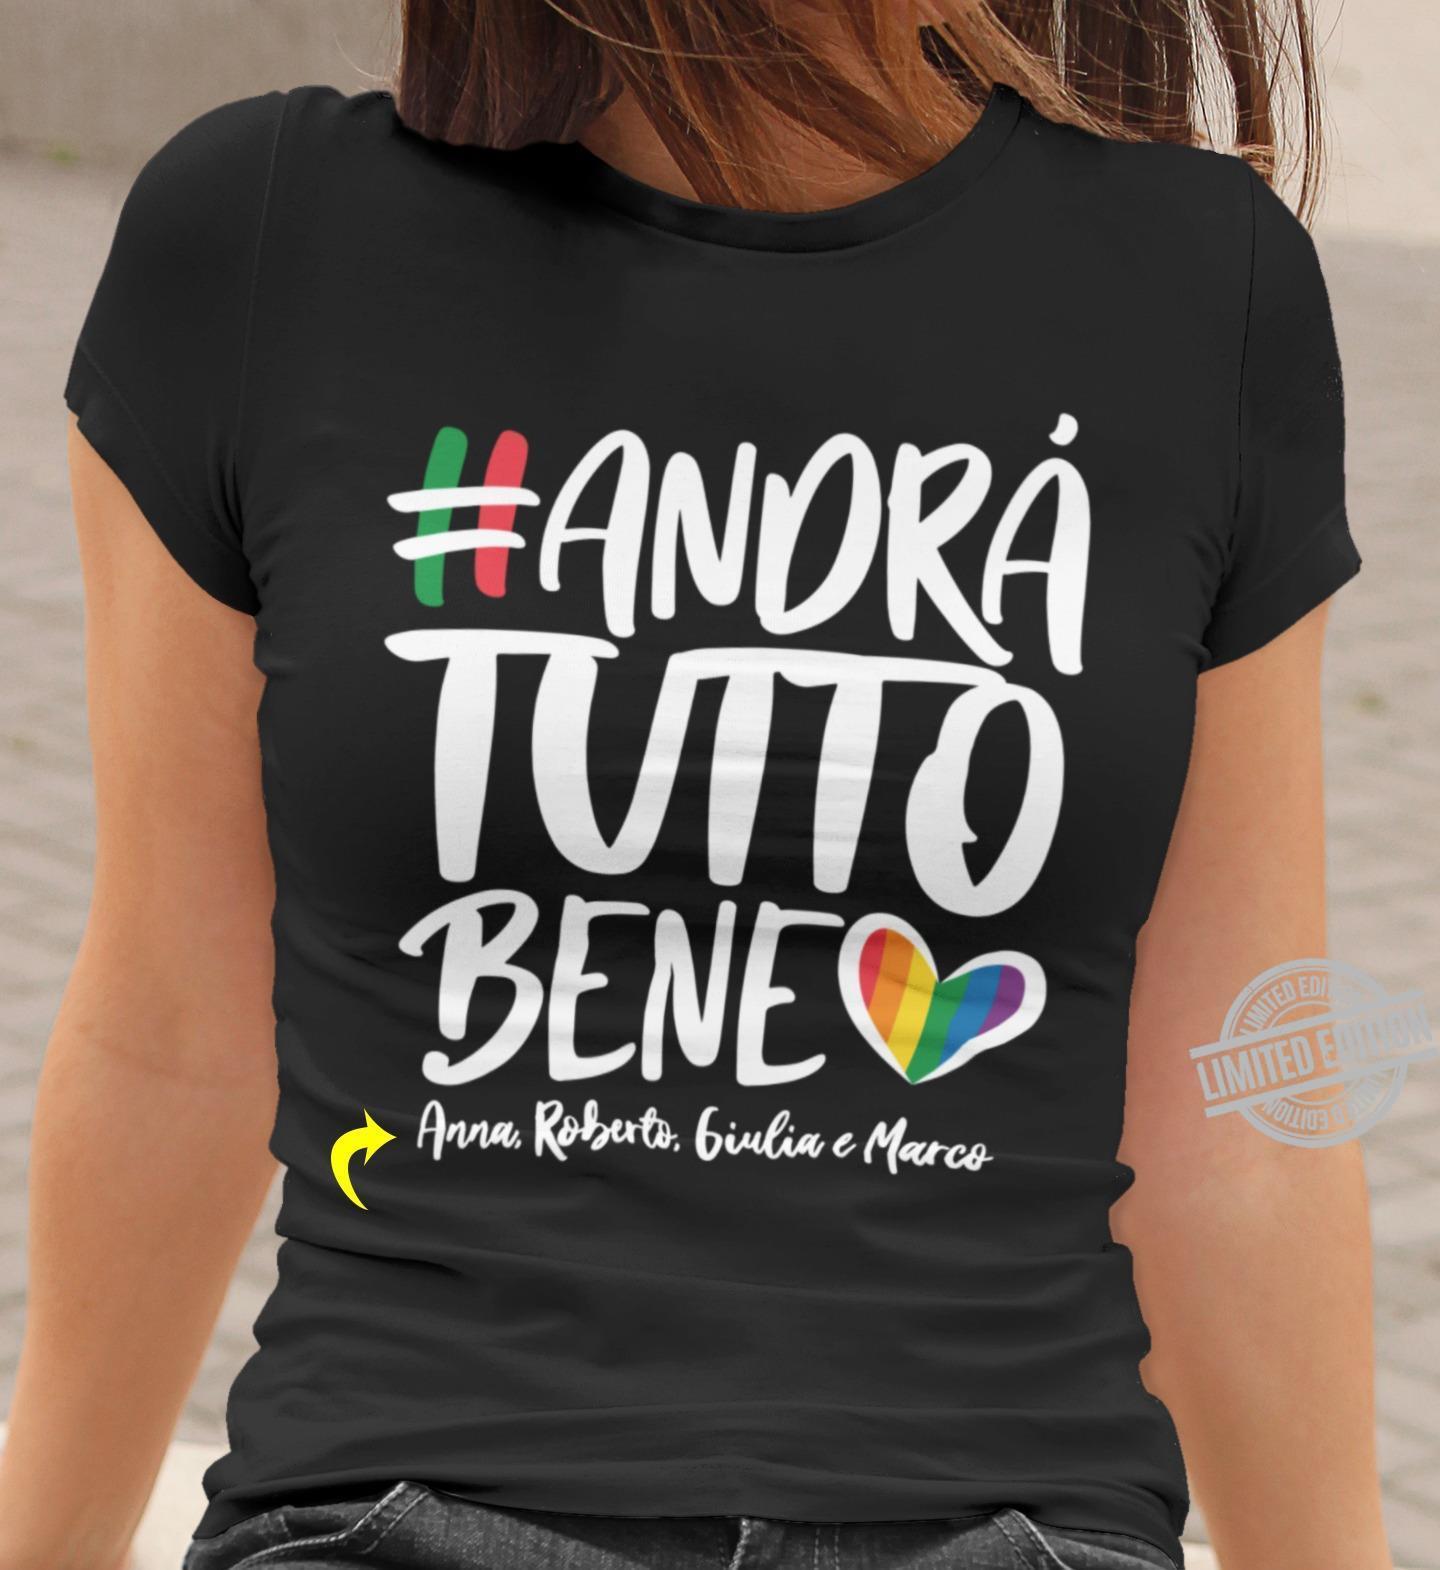 Handra Tutto Bene Anna Robert Biulia Marco Shirt